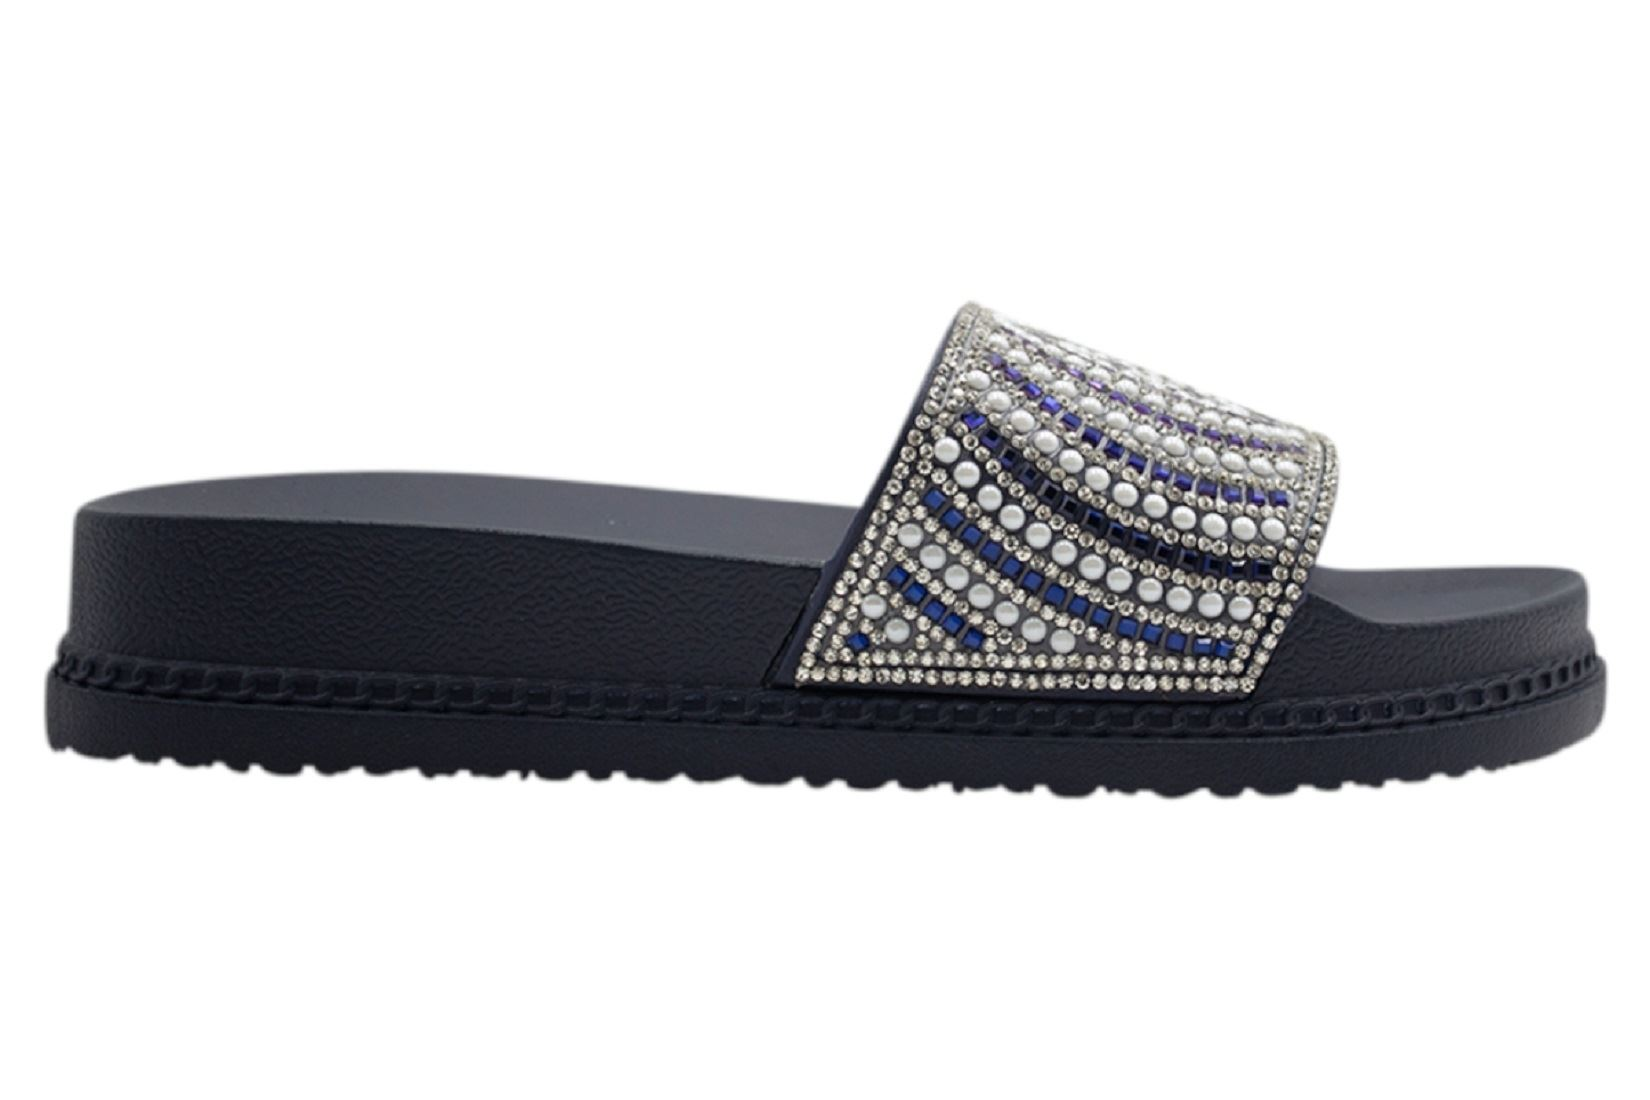 Womens-Sliders-Casual-Slippers-Mules-Ladies-Diamante-Flip-Flop-Sandals-Shoes thumbnail 54